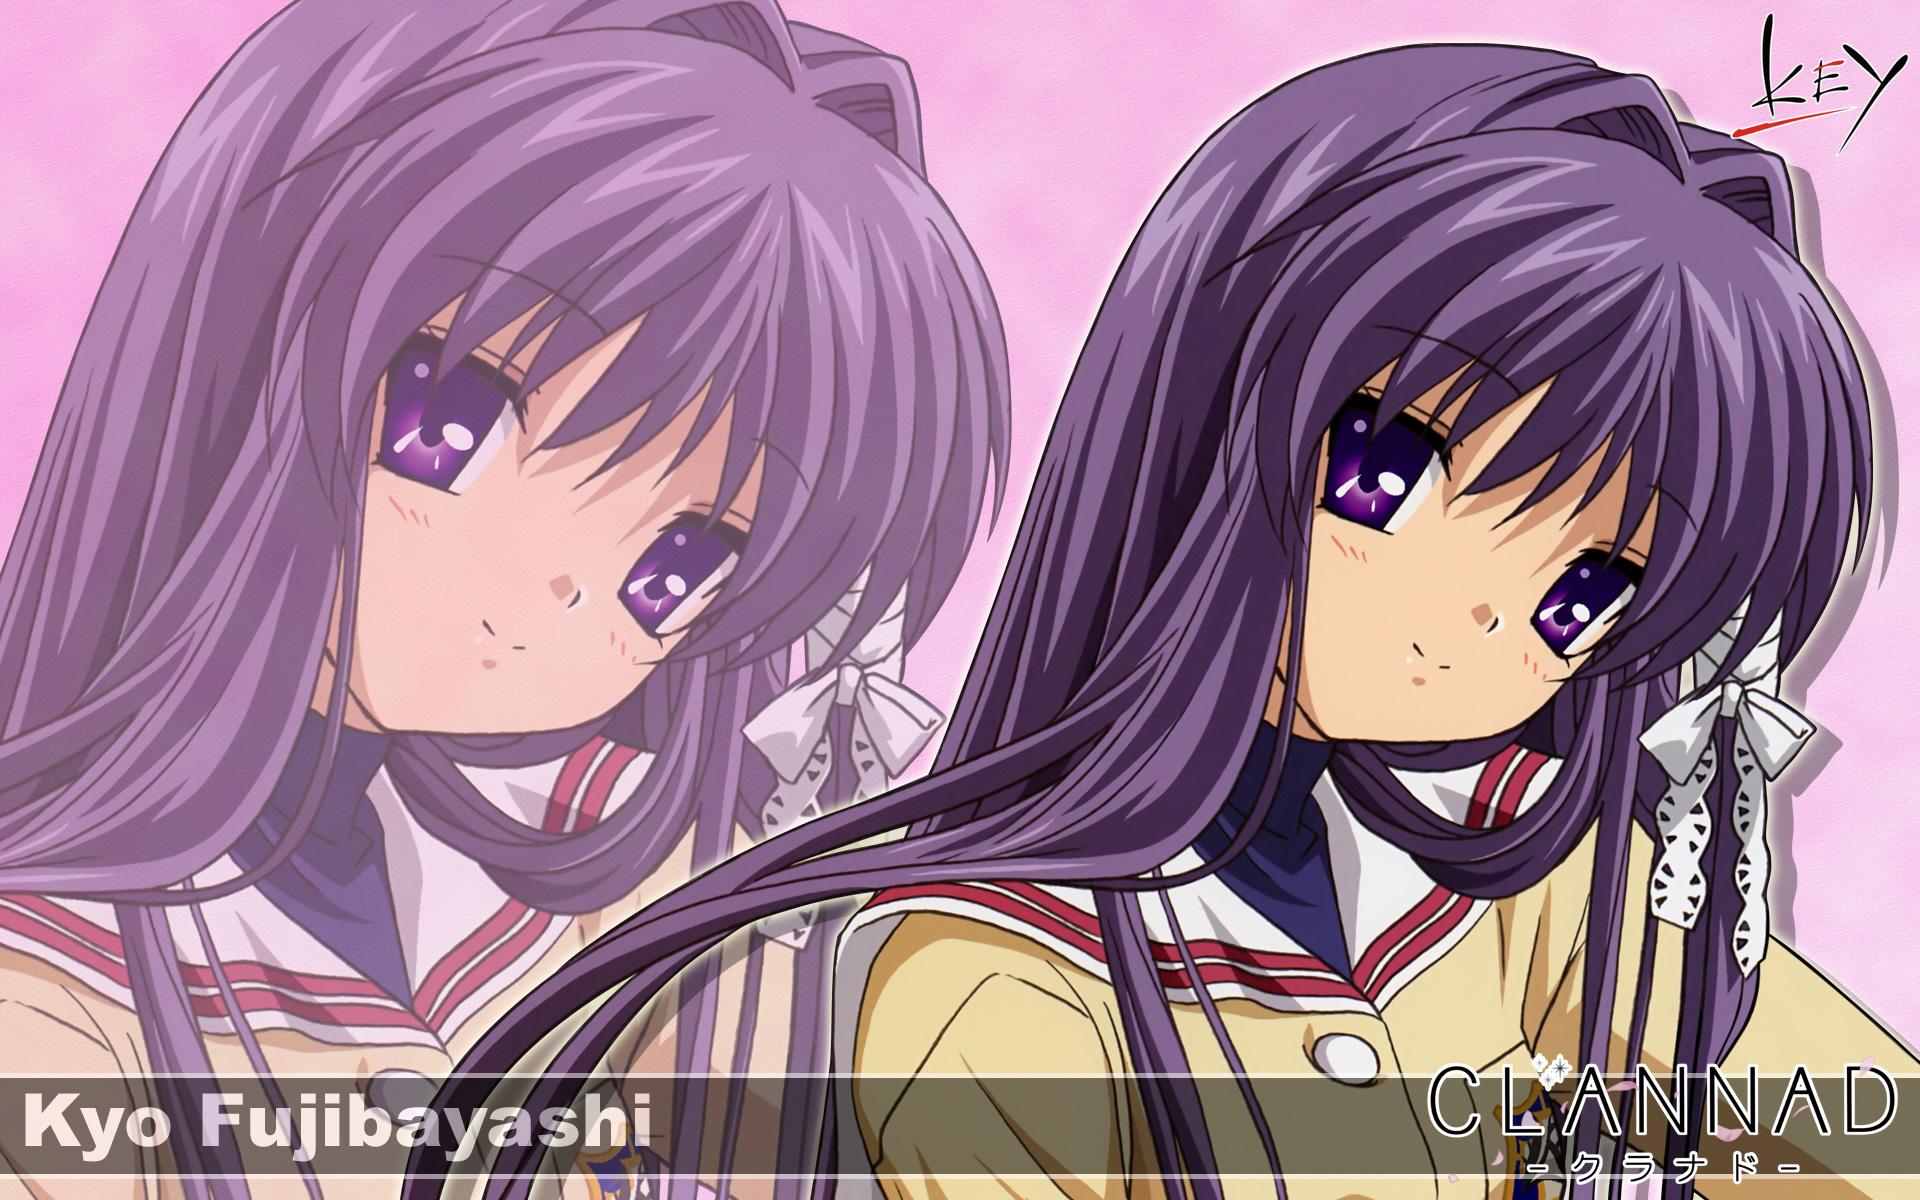 clannad fujibayashi kyou key logo long hair purple eyes ...